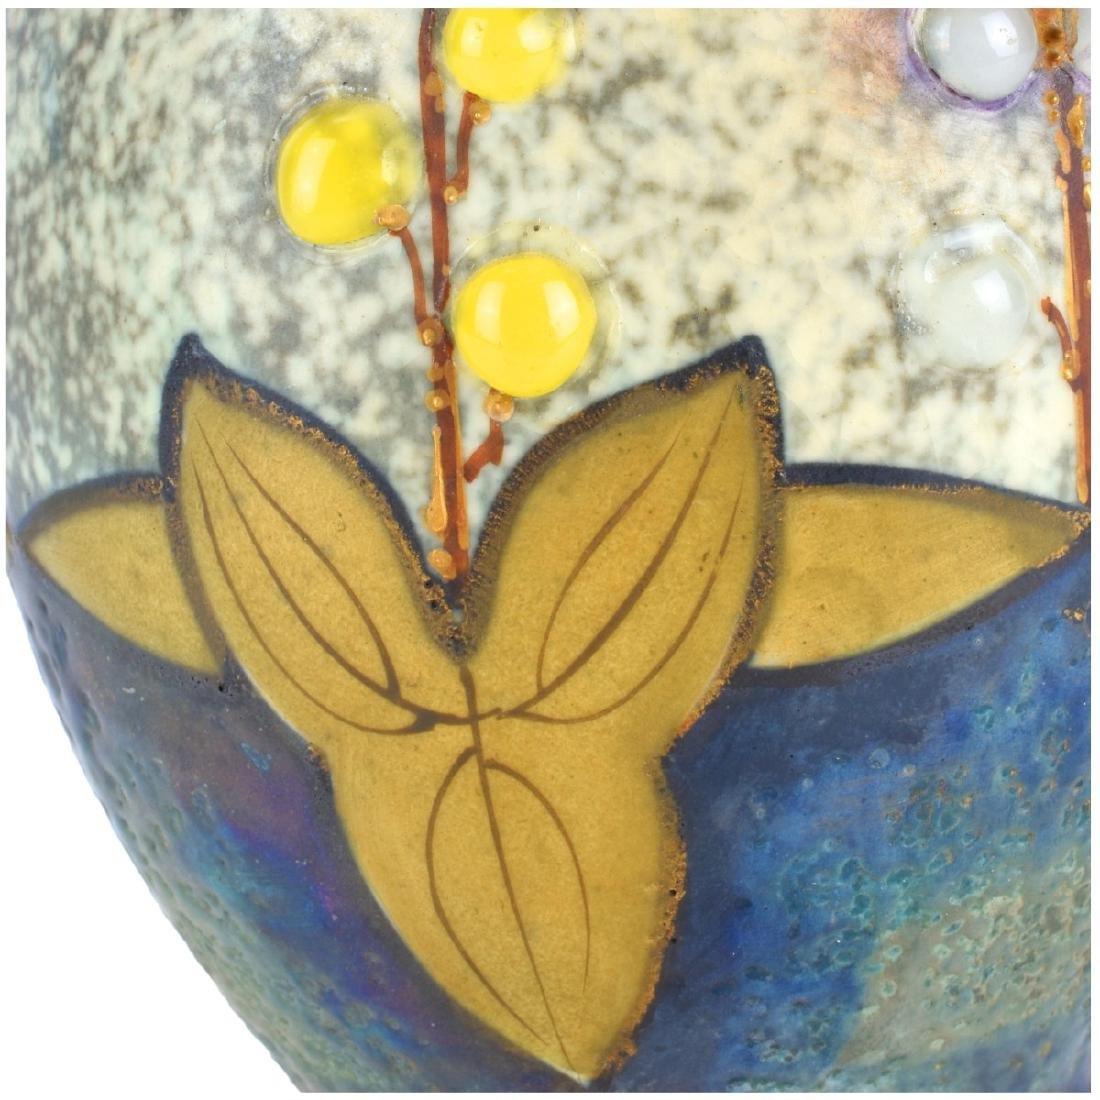 Amphora Austria Gres Bijoux Jeweled Pitcher - 3